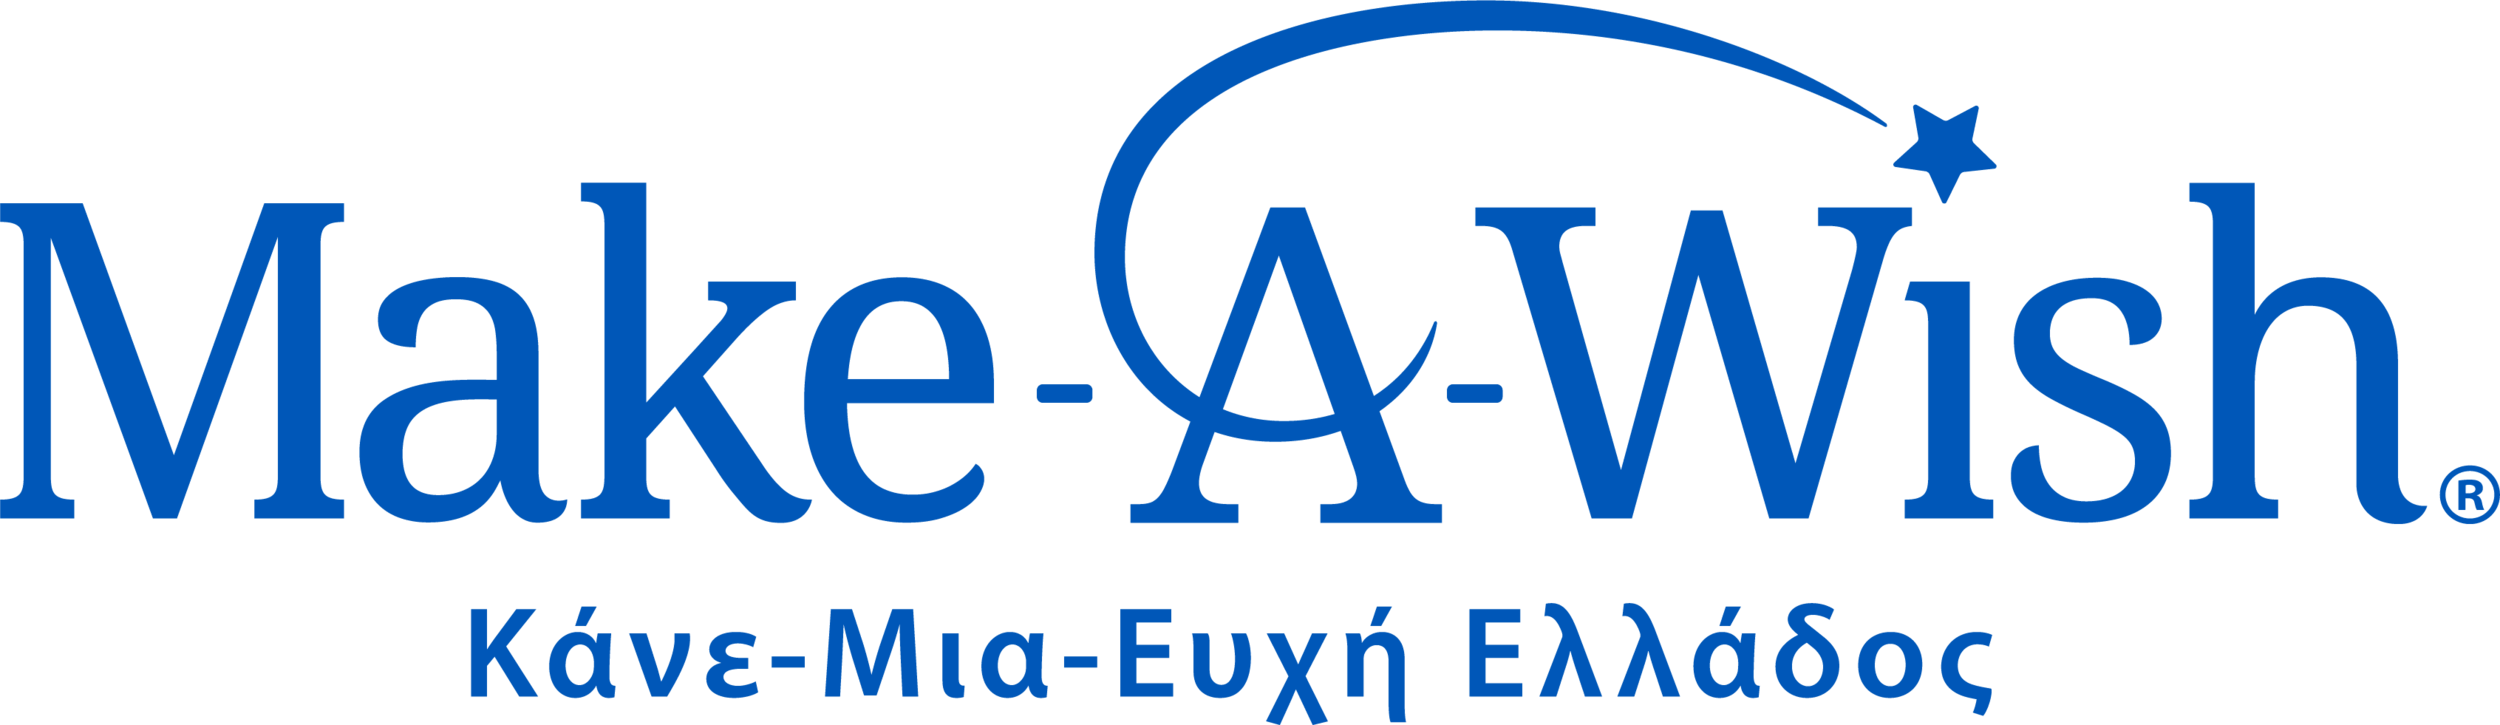 make a wish Greece official logo | YouBeHero